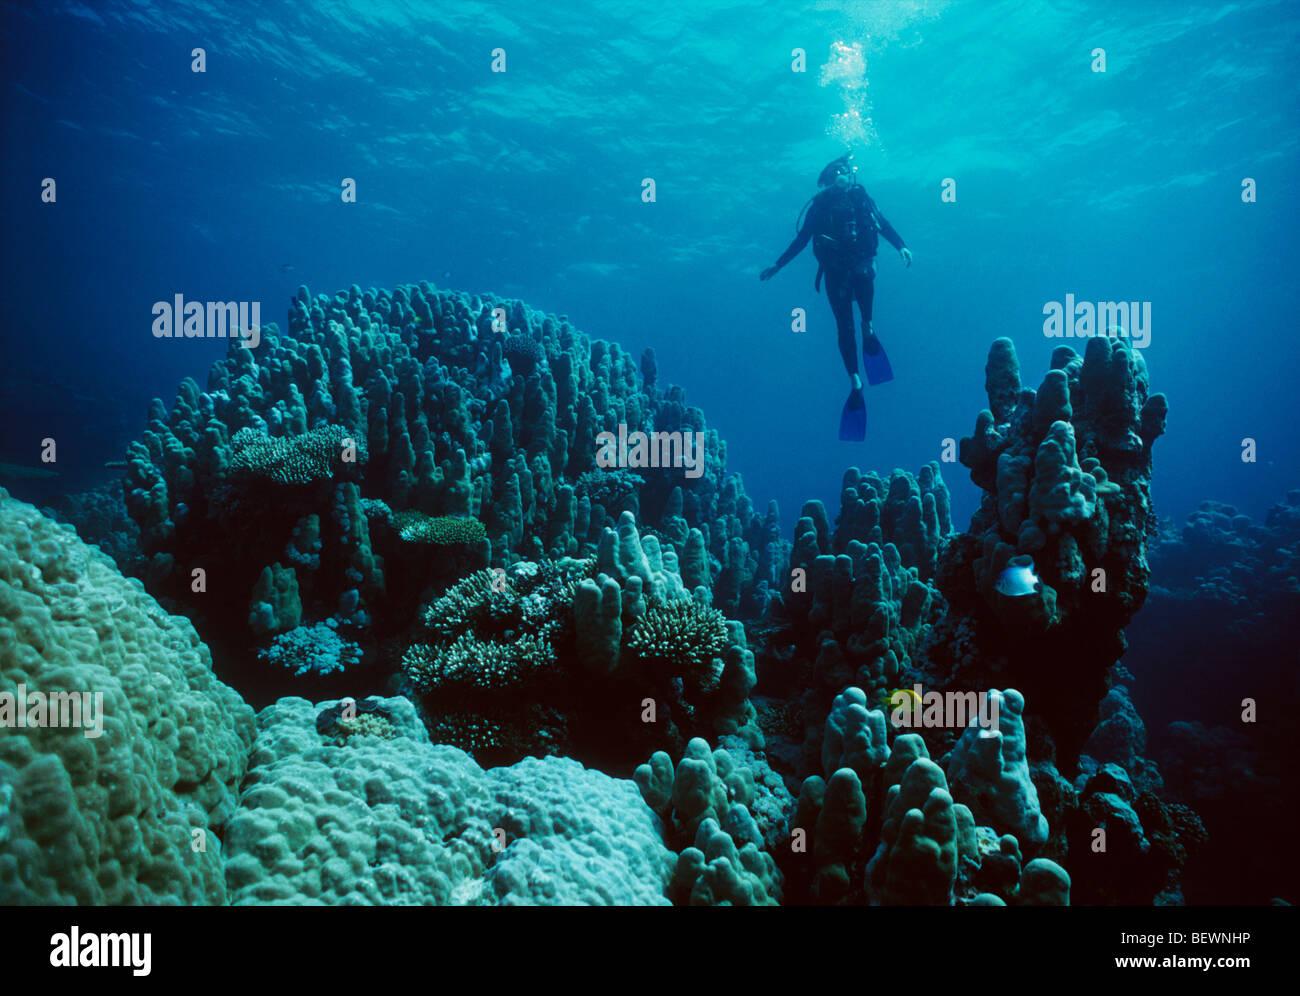 Scuba diver explores coral reef. Sinai, Egypt - Red Sea - Stock Image